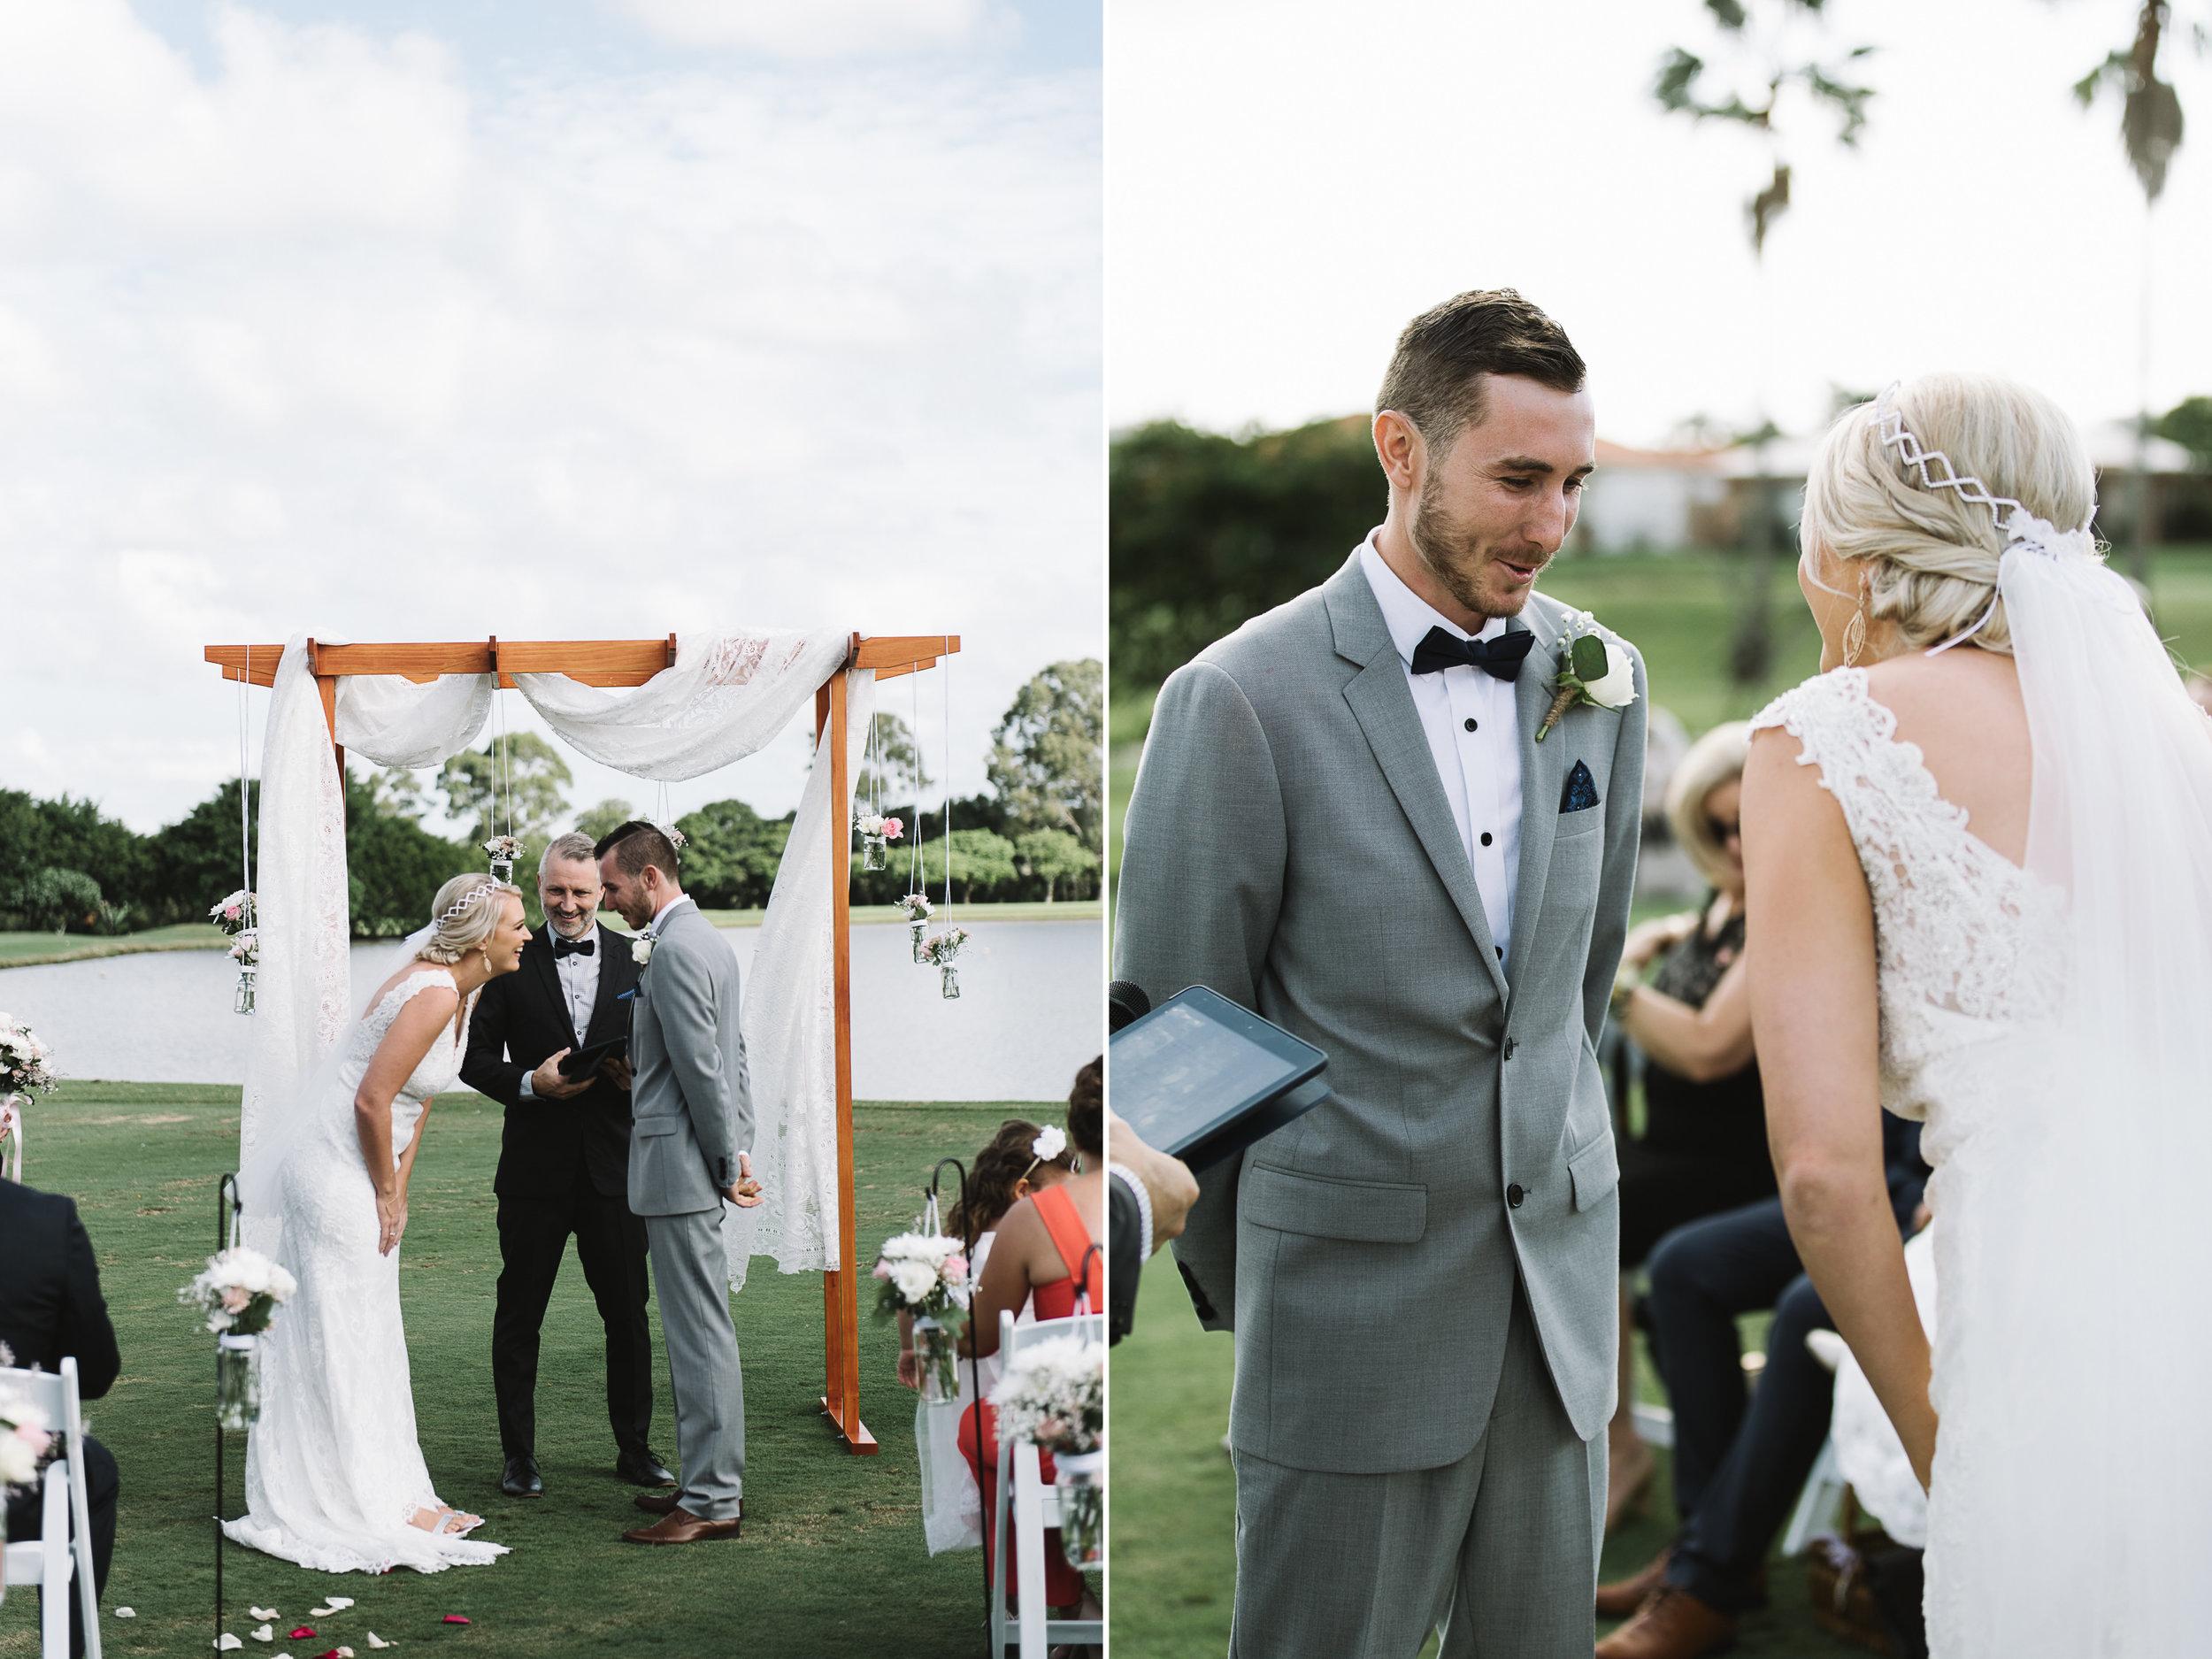 Brisbane-wedding-photography-17.jpg